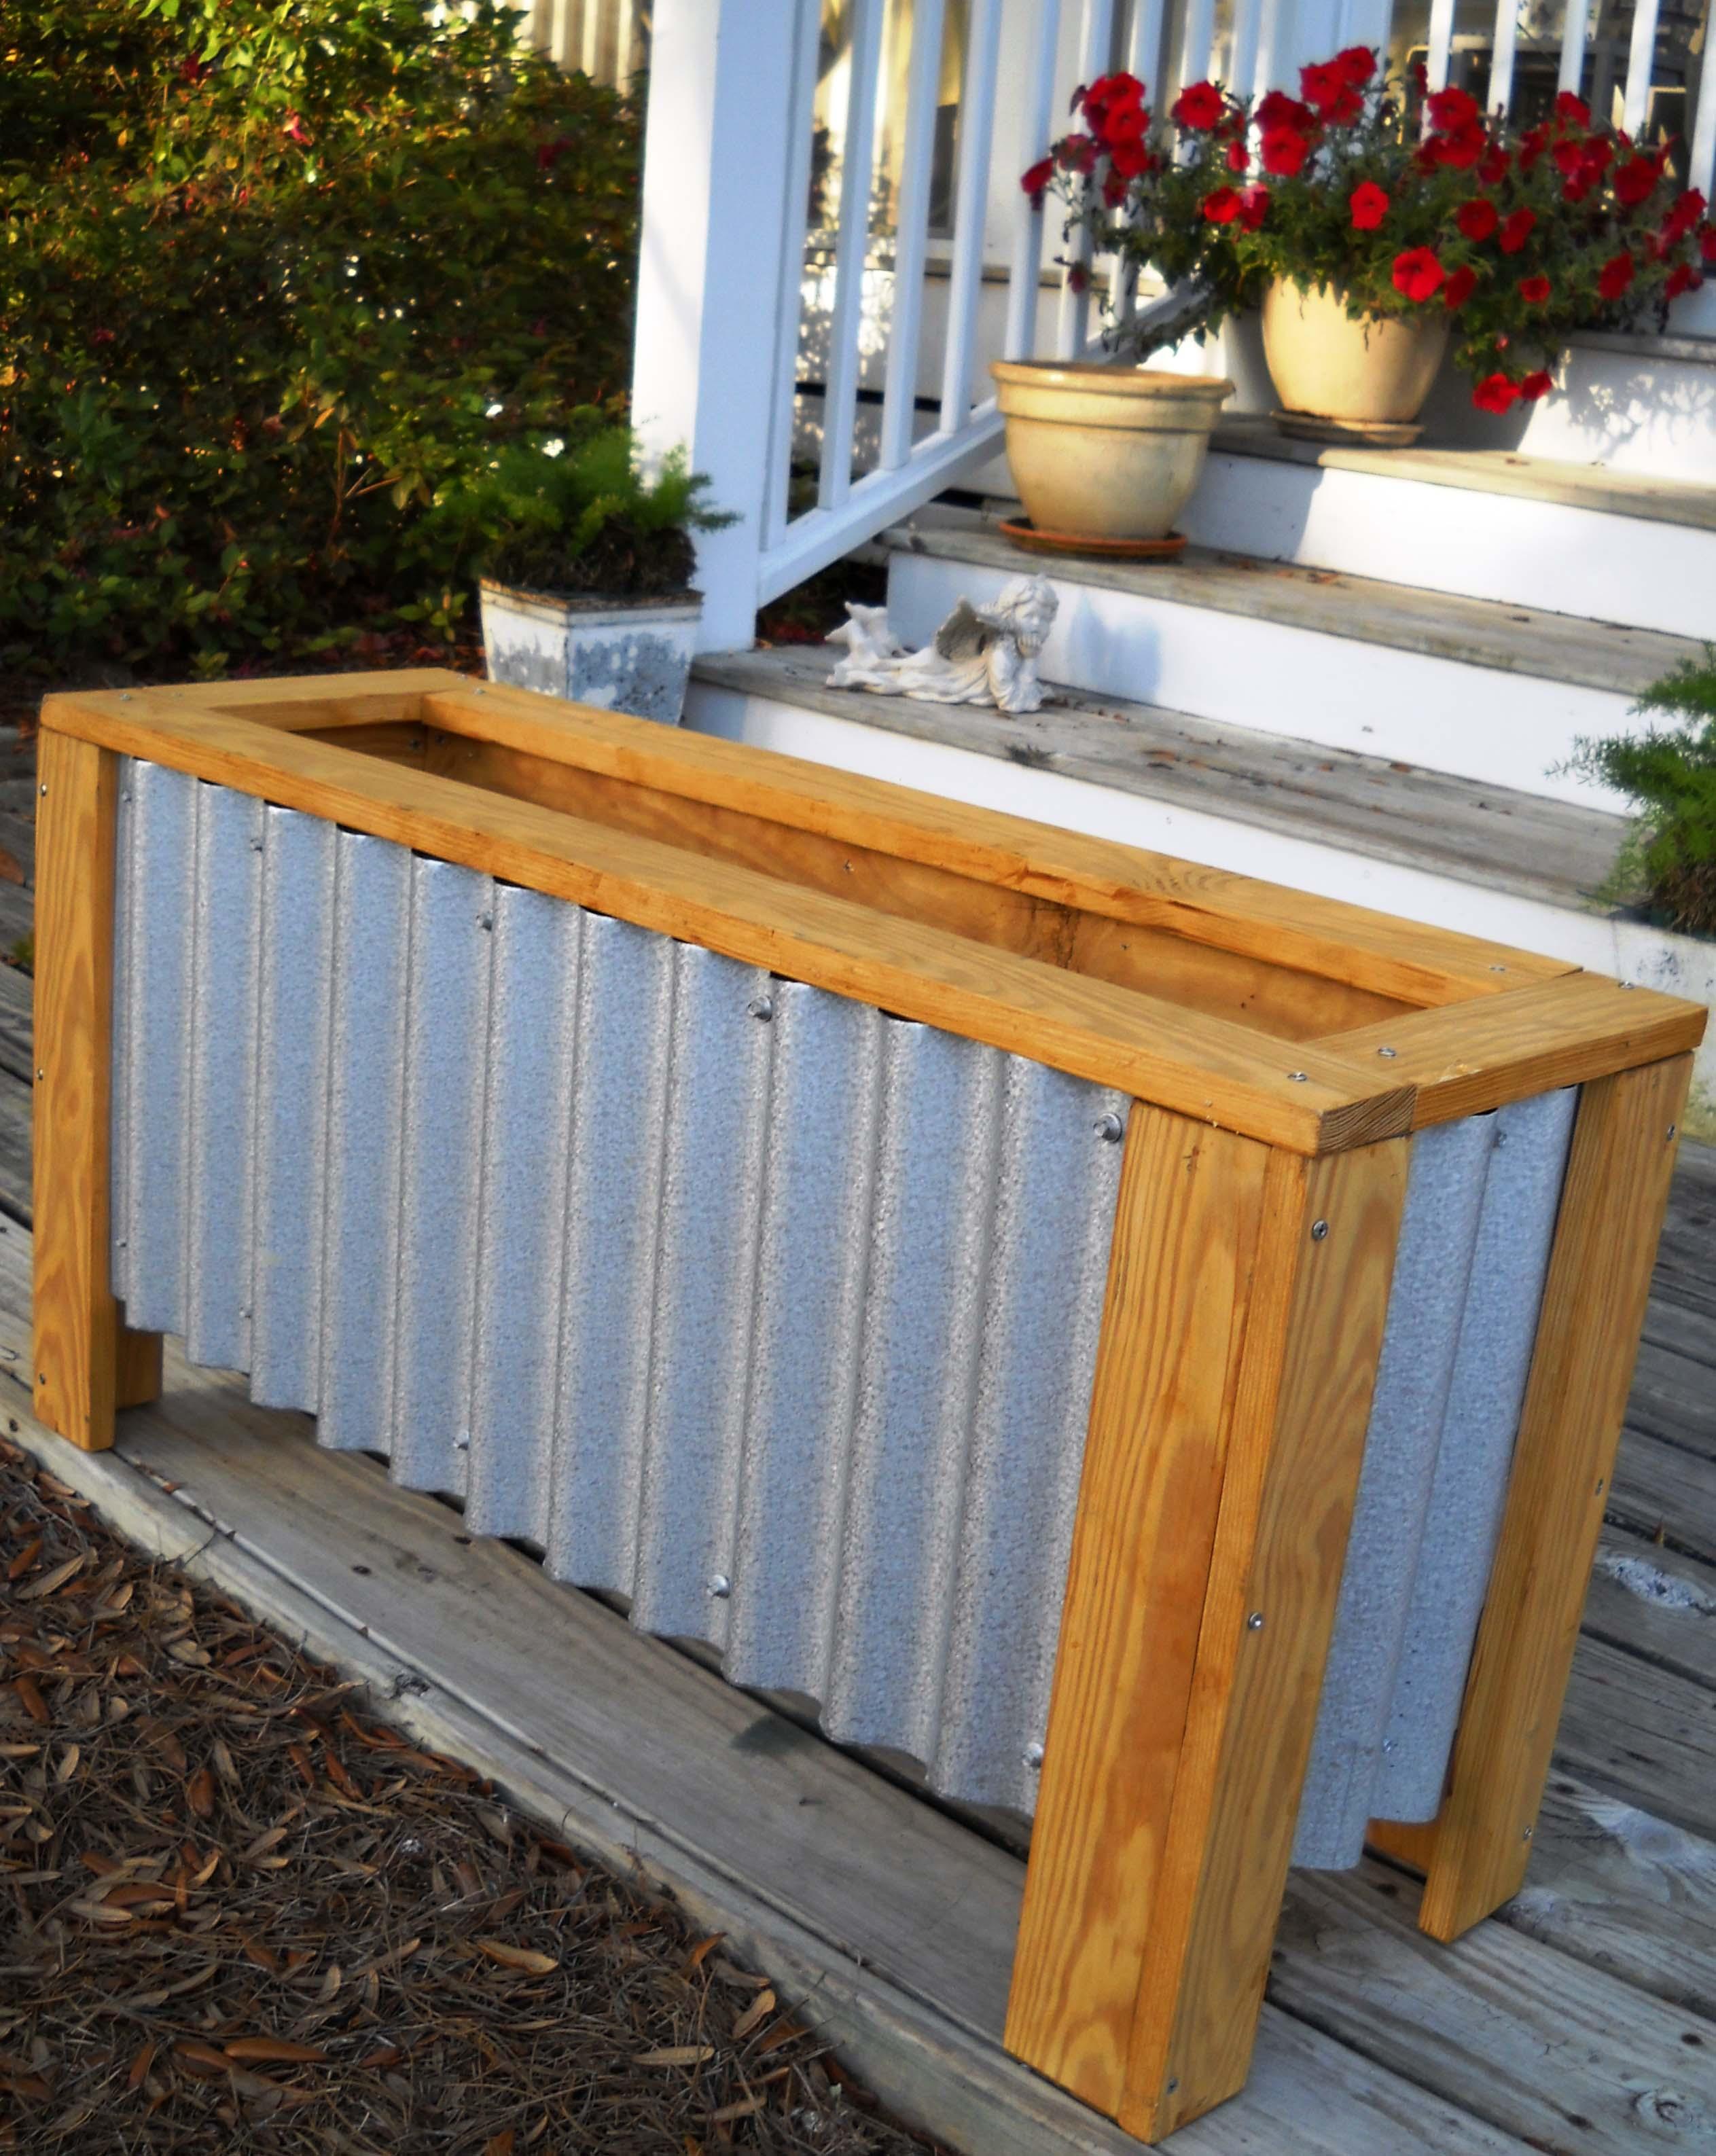 Superbe Garden Box Design With Planter Designs